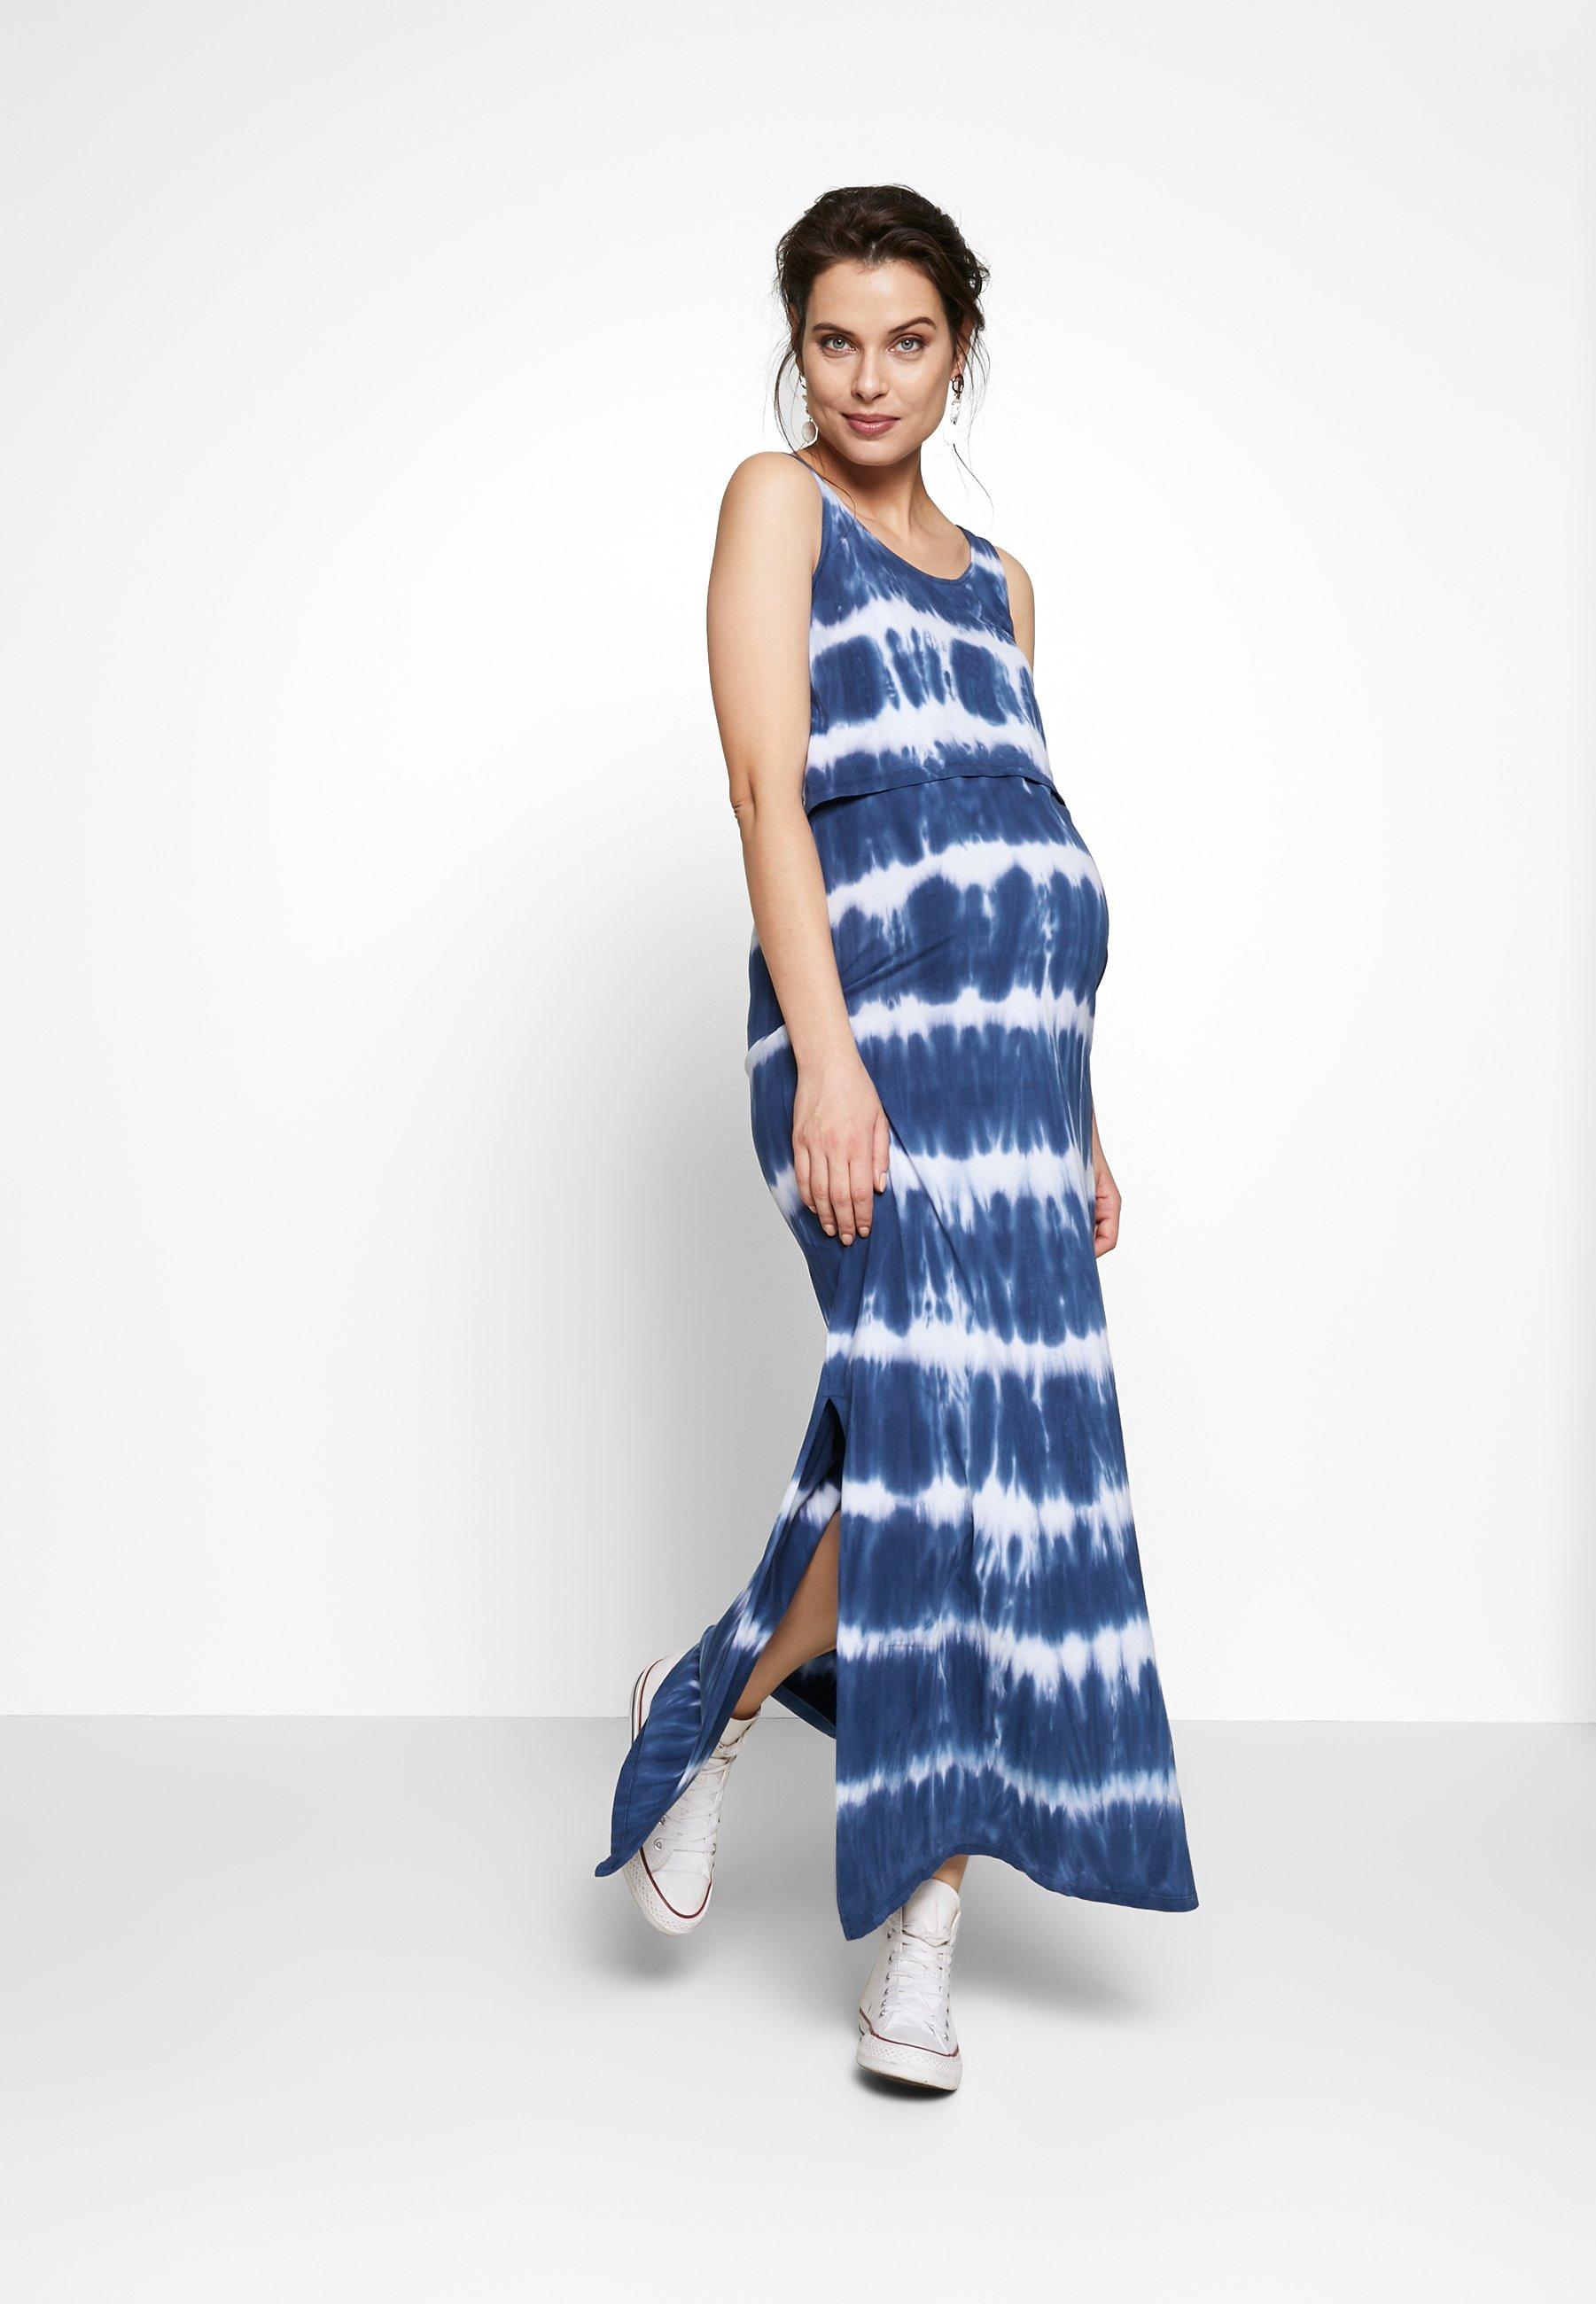 Ohma! Nursing Tie Dye - Maxiklänning Blue/white